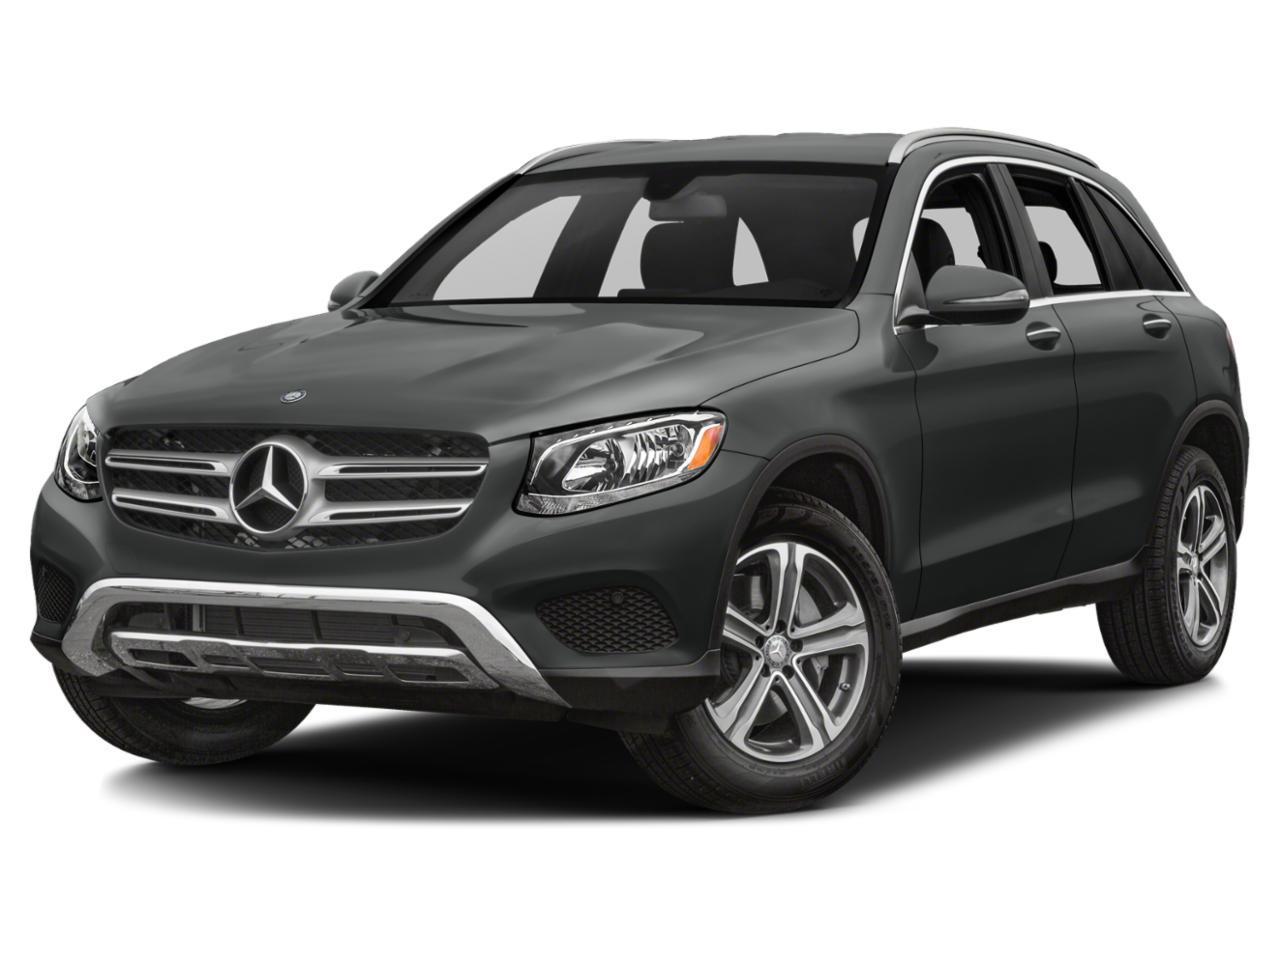 2018 Mercedes-Benz GLC Vehicle Photo in San Antonio, TX 78257